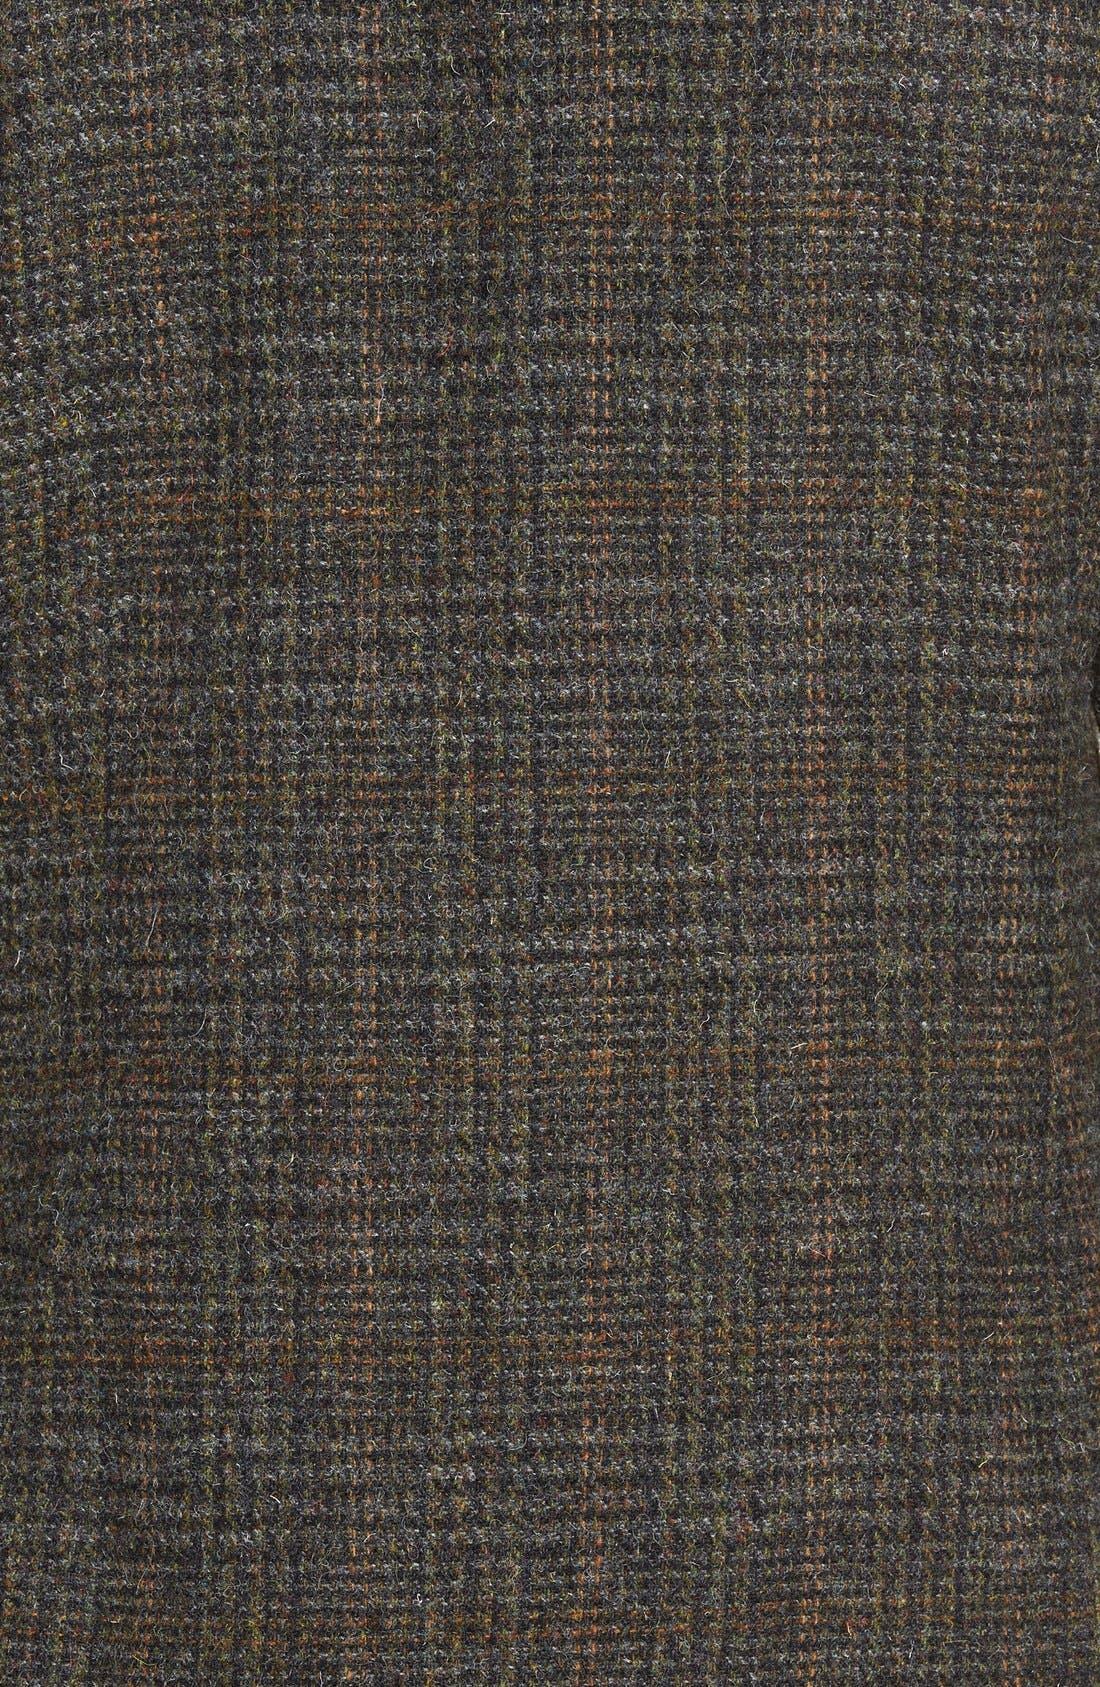 Harris Tweed HybridJacket,                             Alternate thumbnail 4, color,                             300